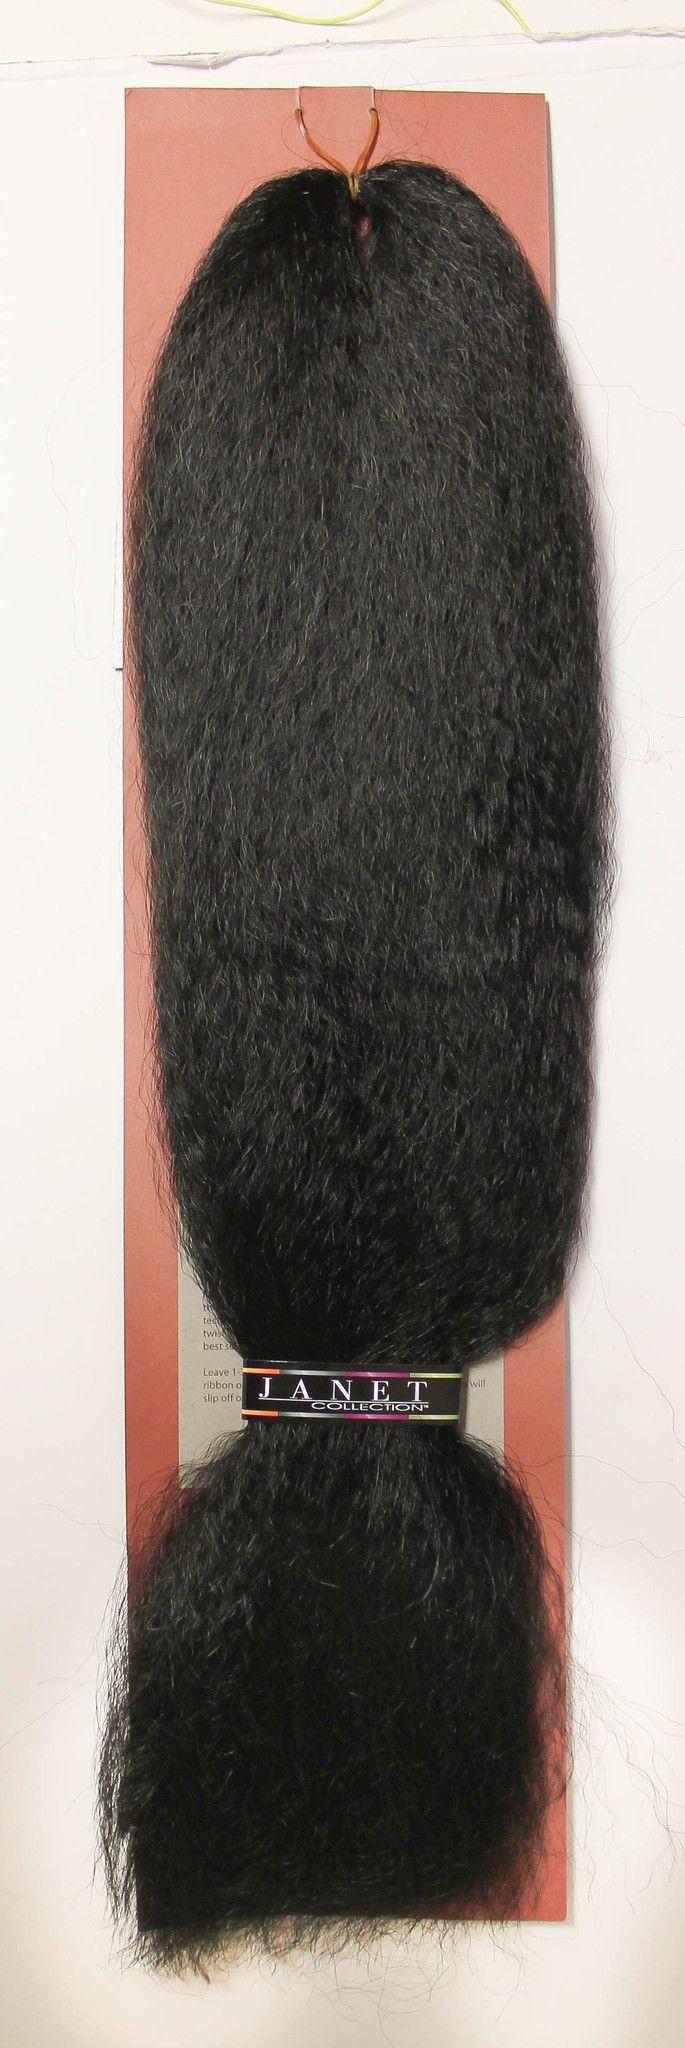 Janet Collection 100% Kanekalon Jumbo Braiding Hair ...